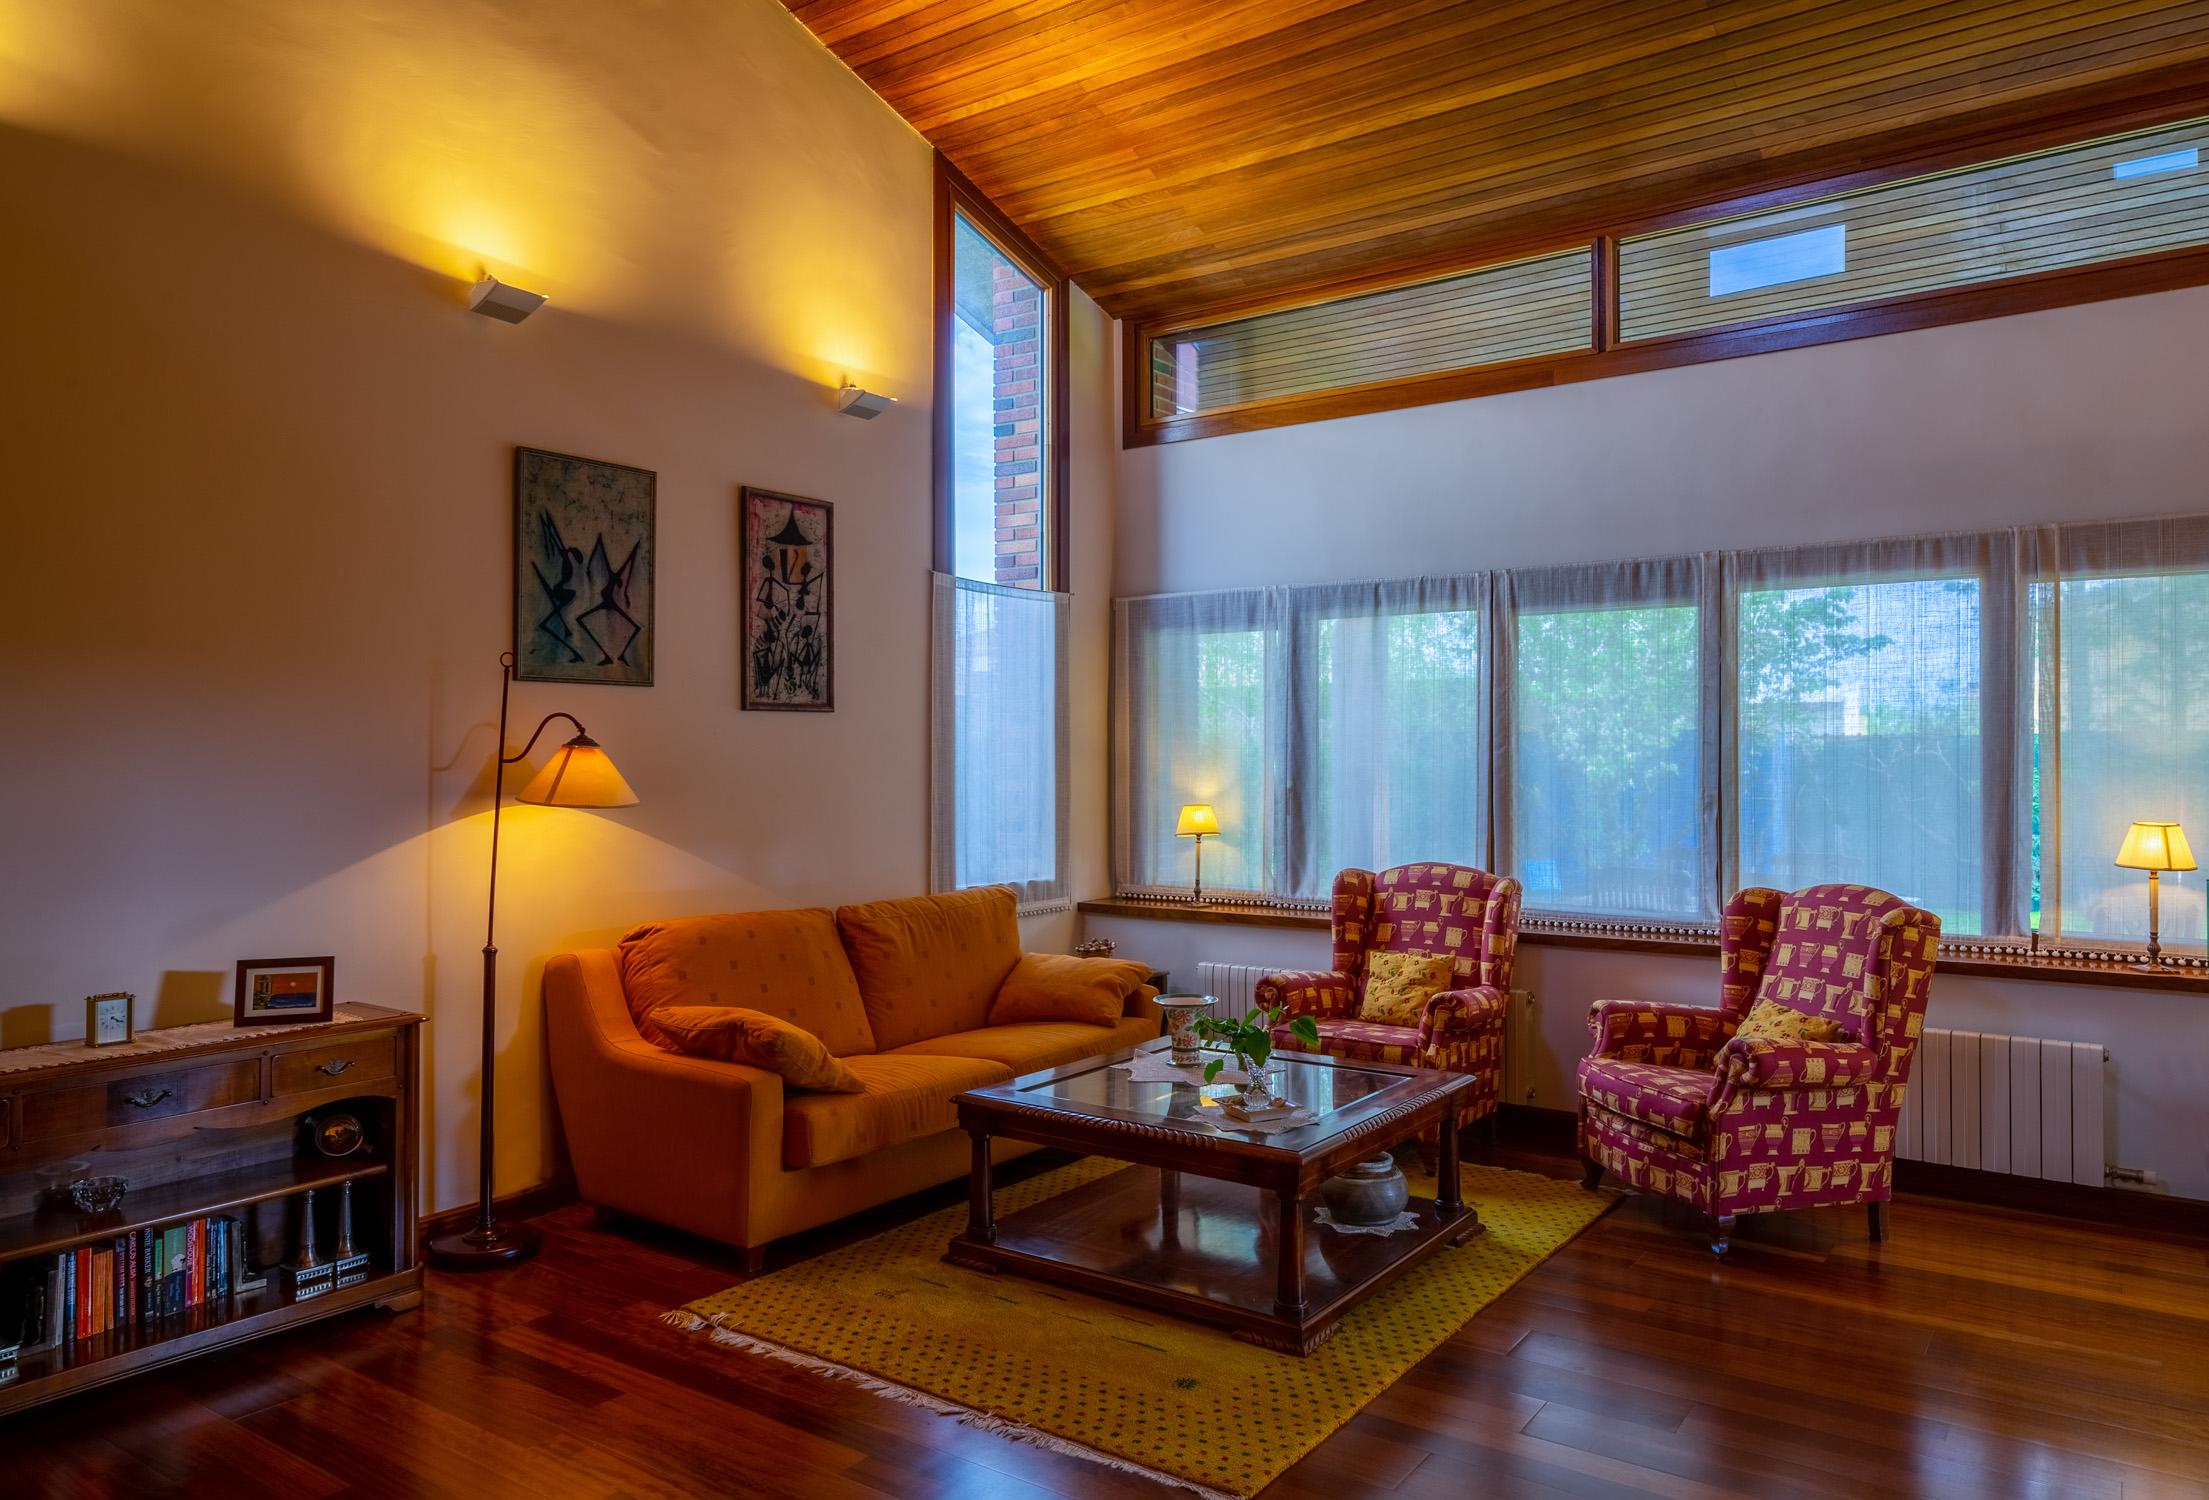 Fotografo Inmobiliaria Decoracion Interiores